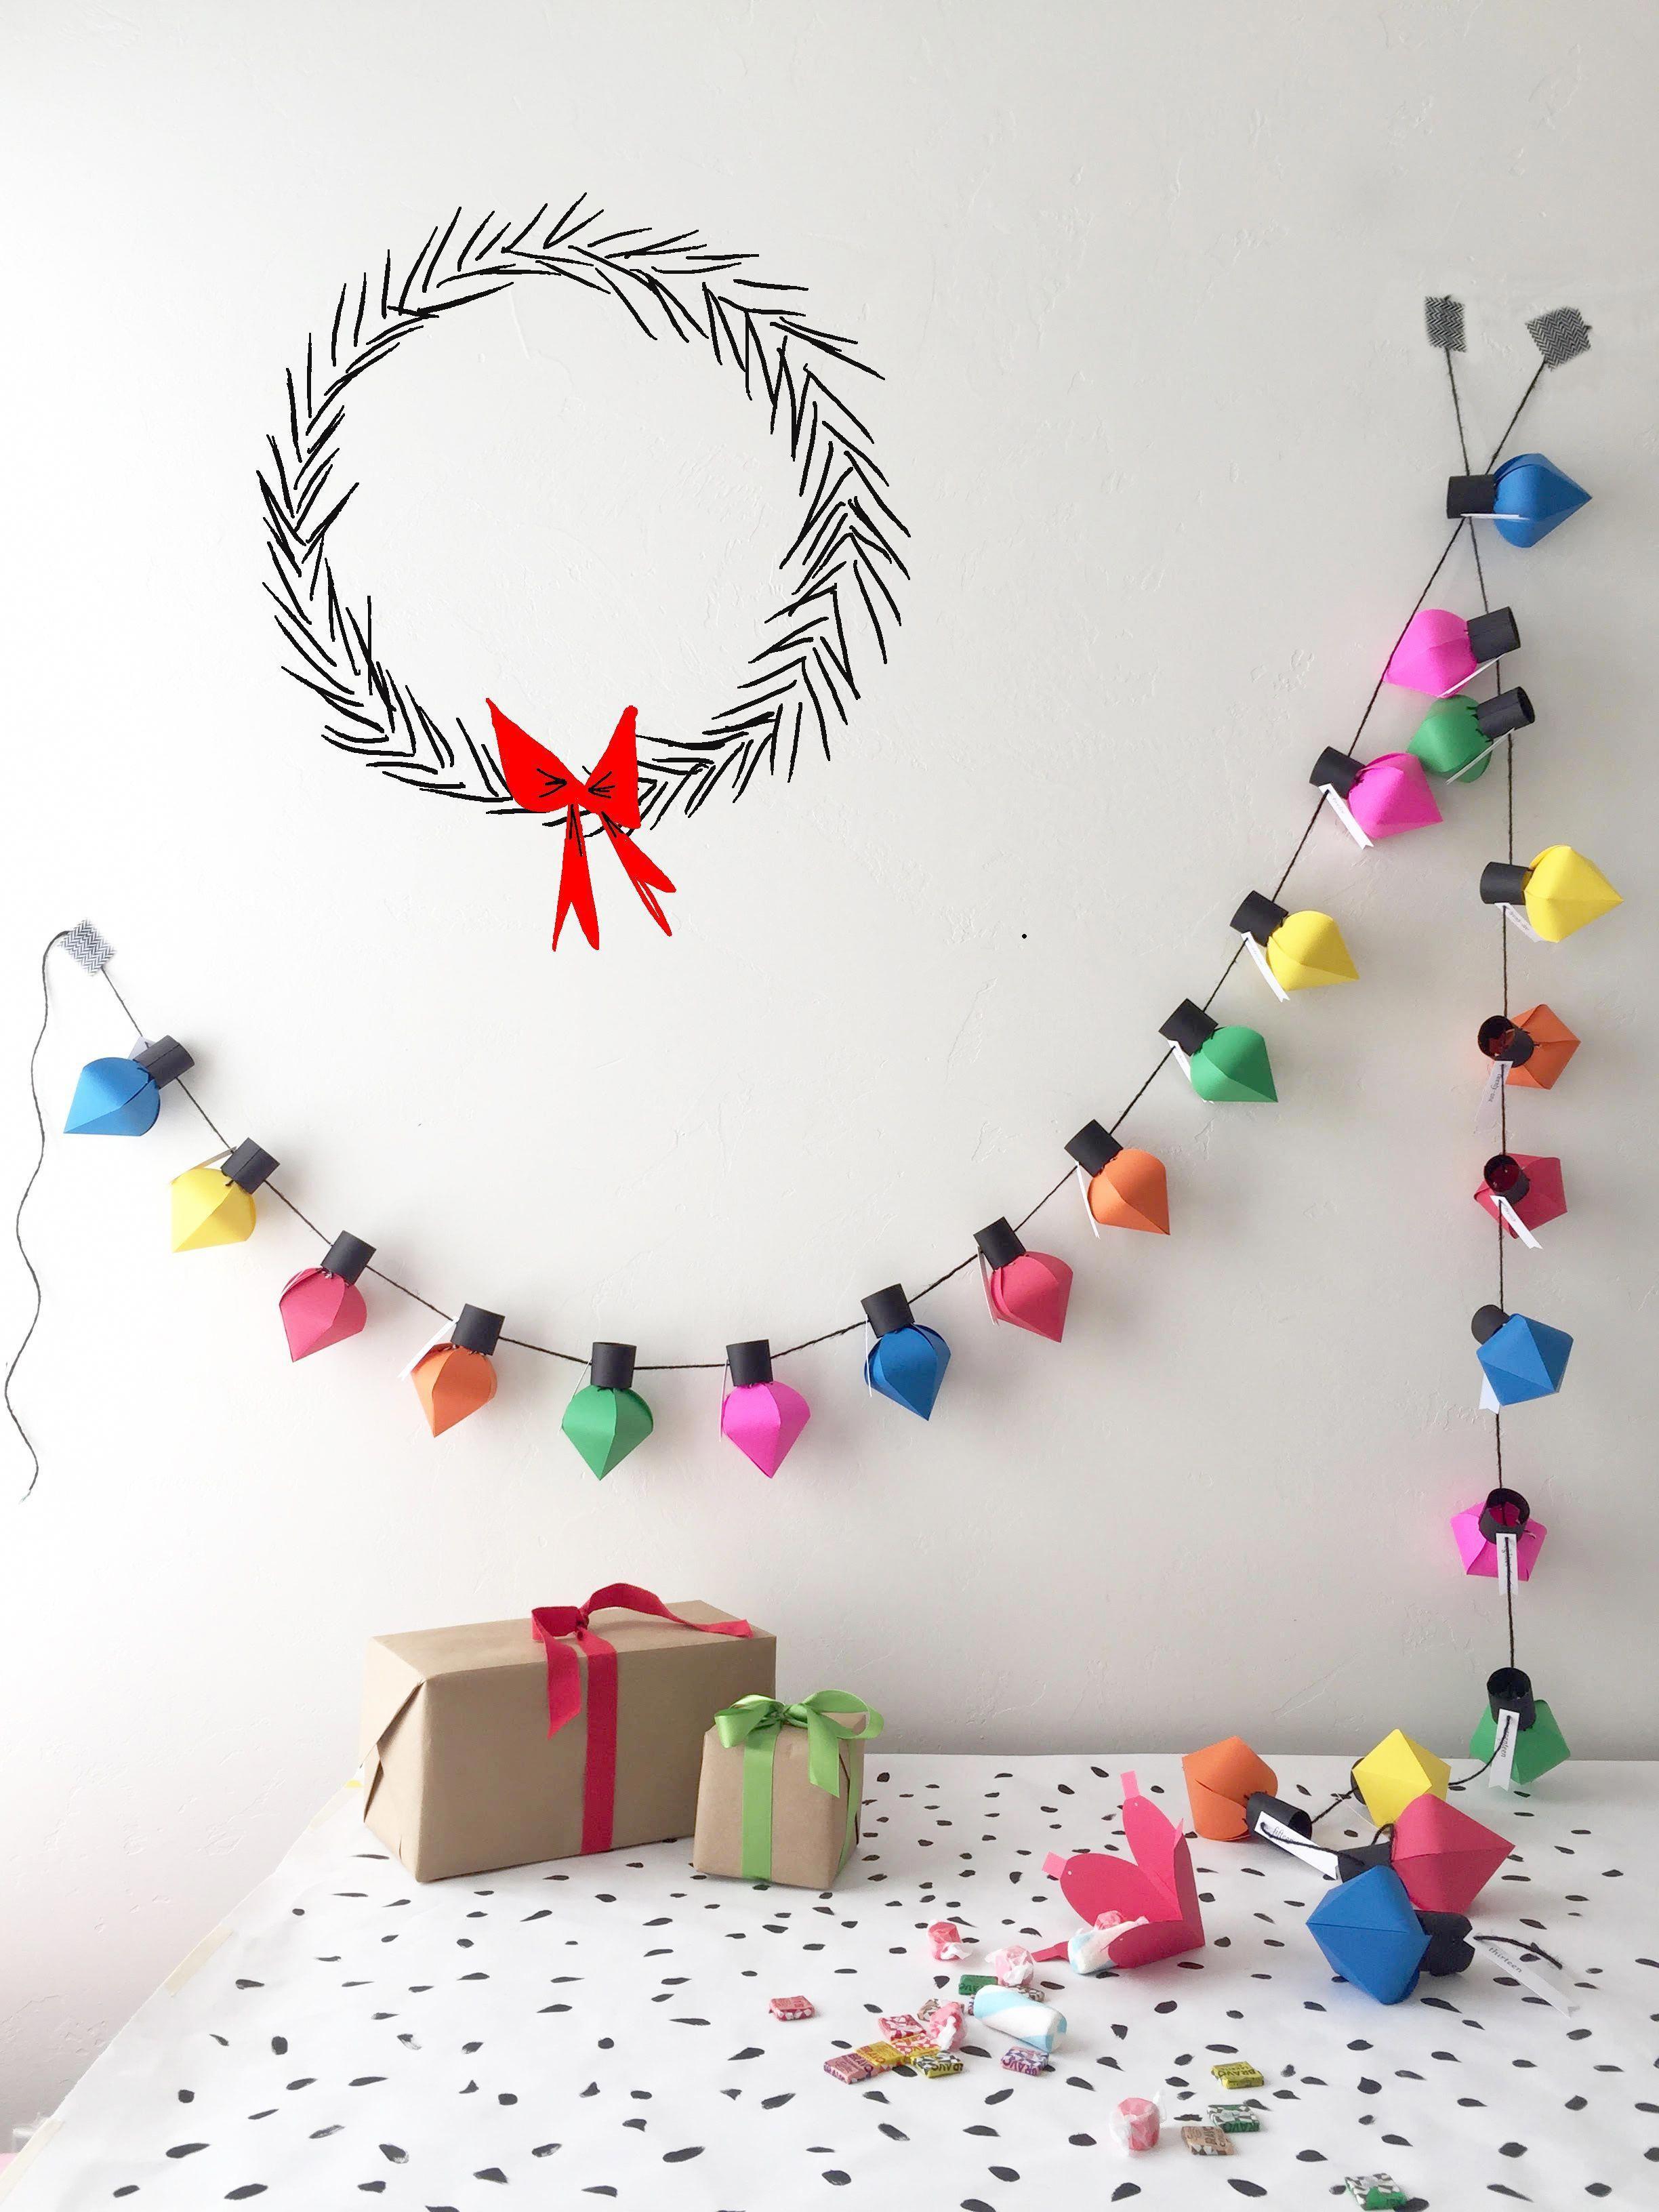 DIY Christmas bulb advent calendar plete with templates and full